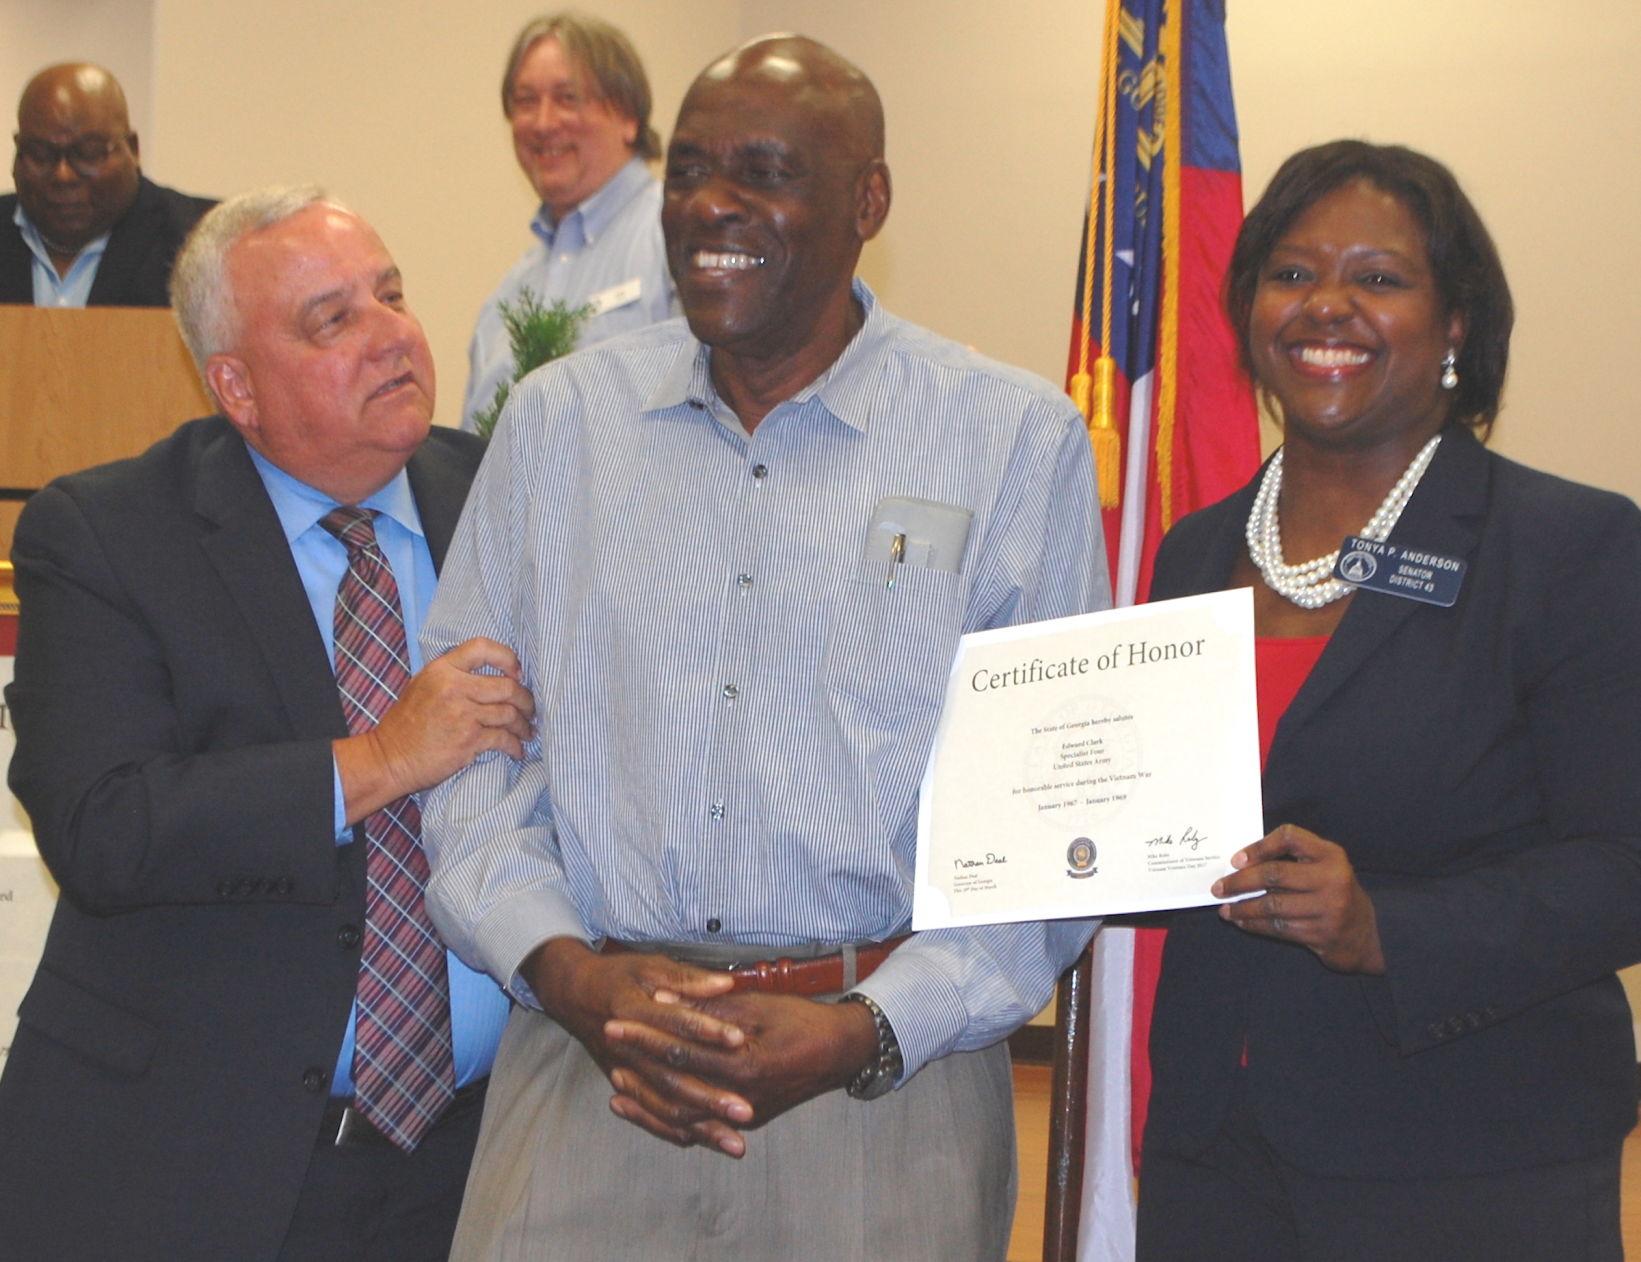 Vietnam veterans in Newton honored at ceremony